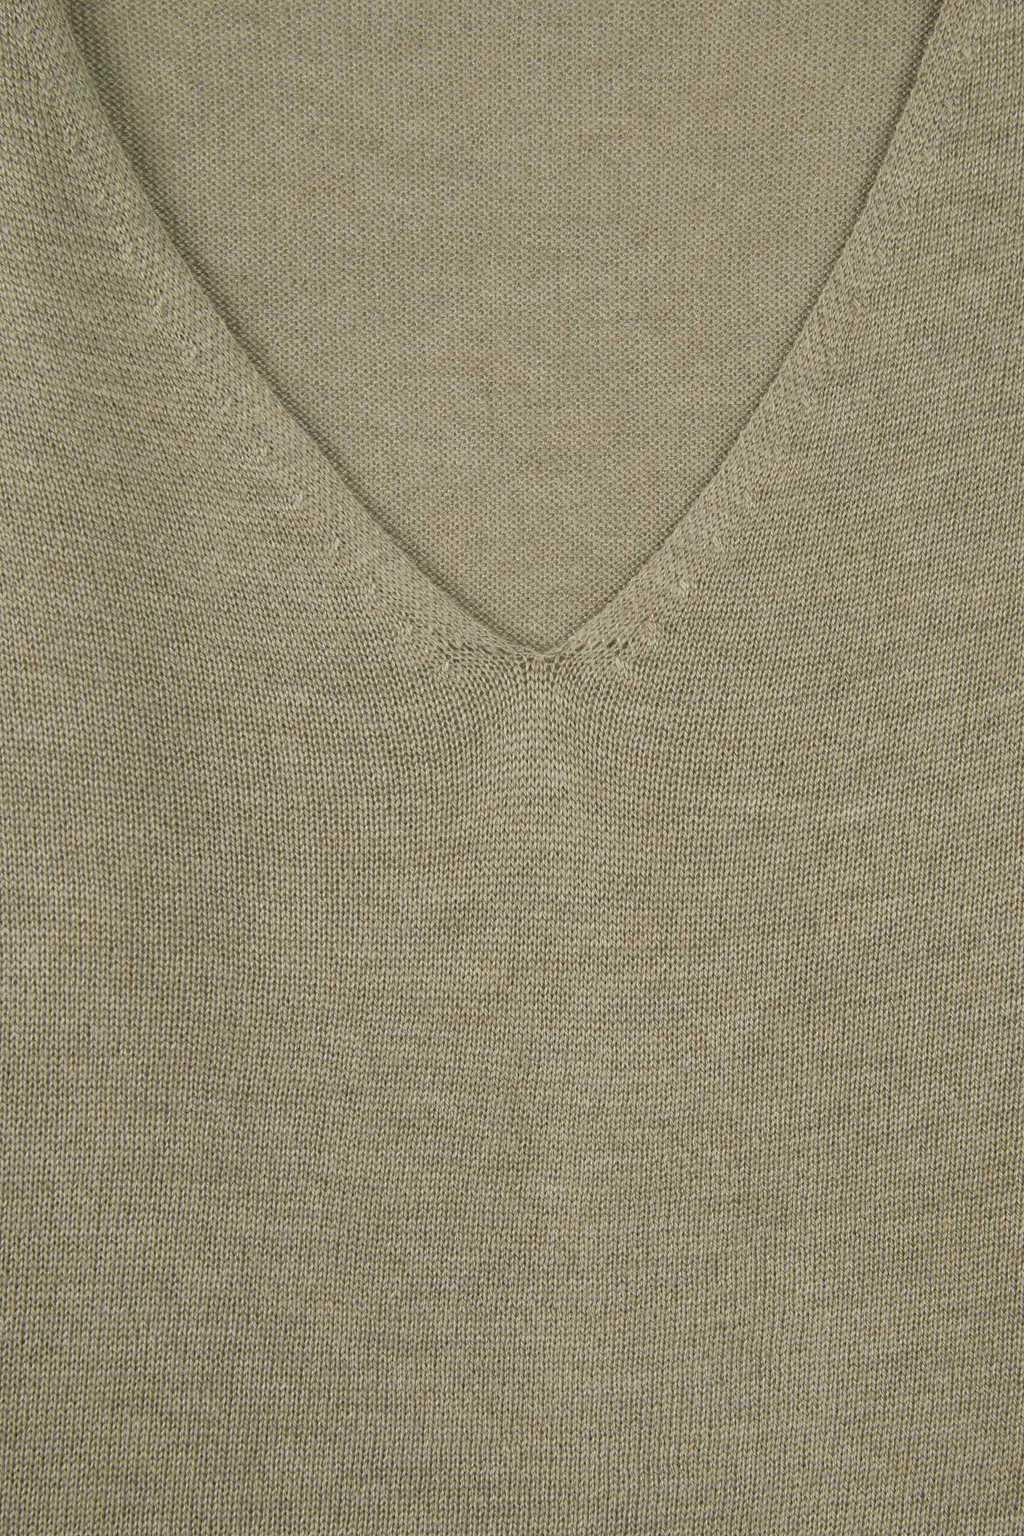 Sweater 3448 Sage 6